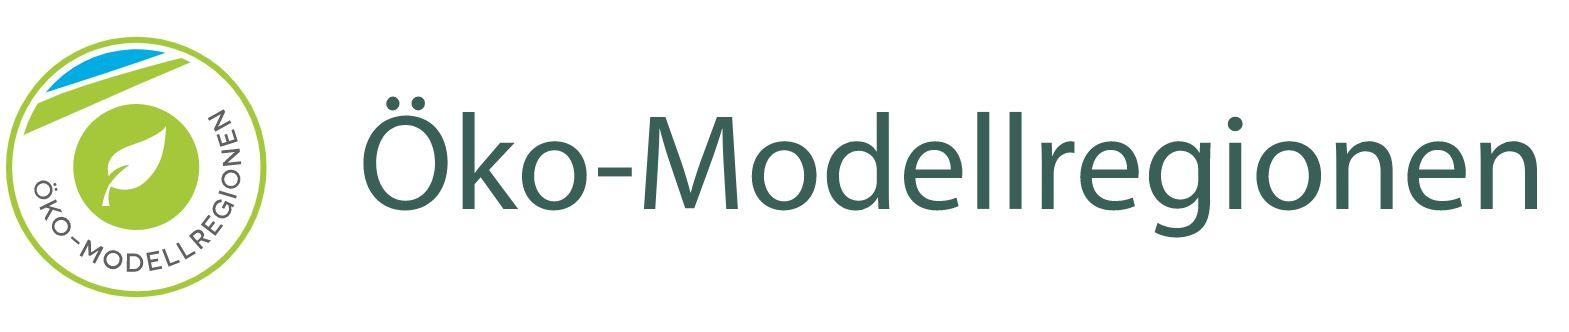 Öko-Modellregionen